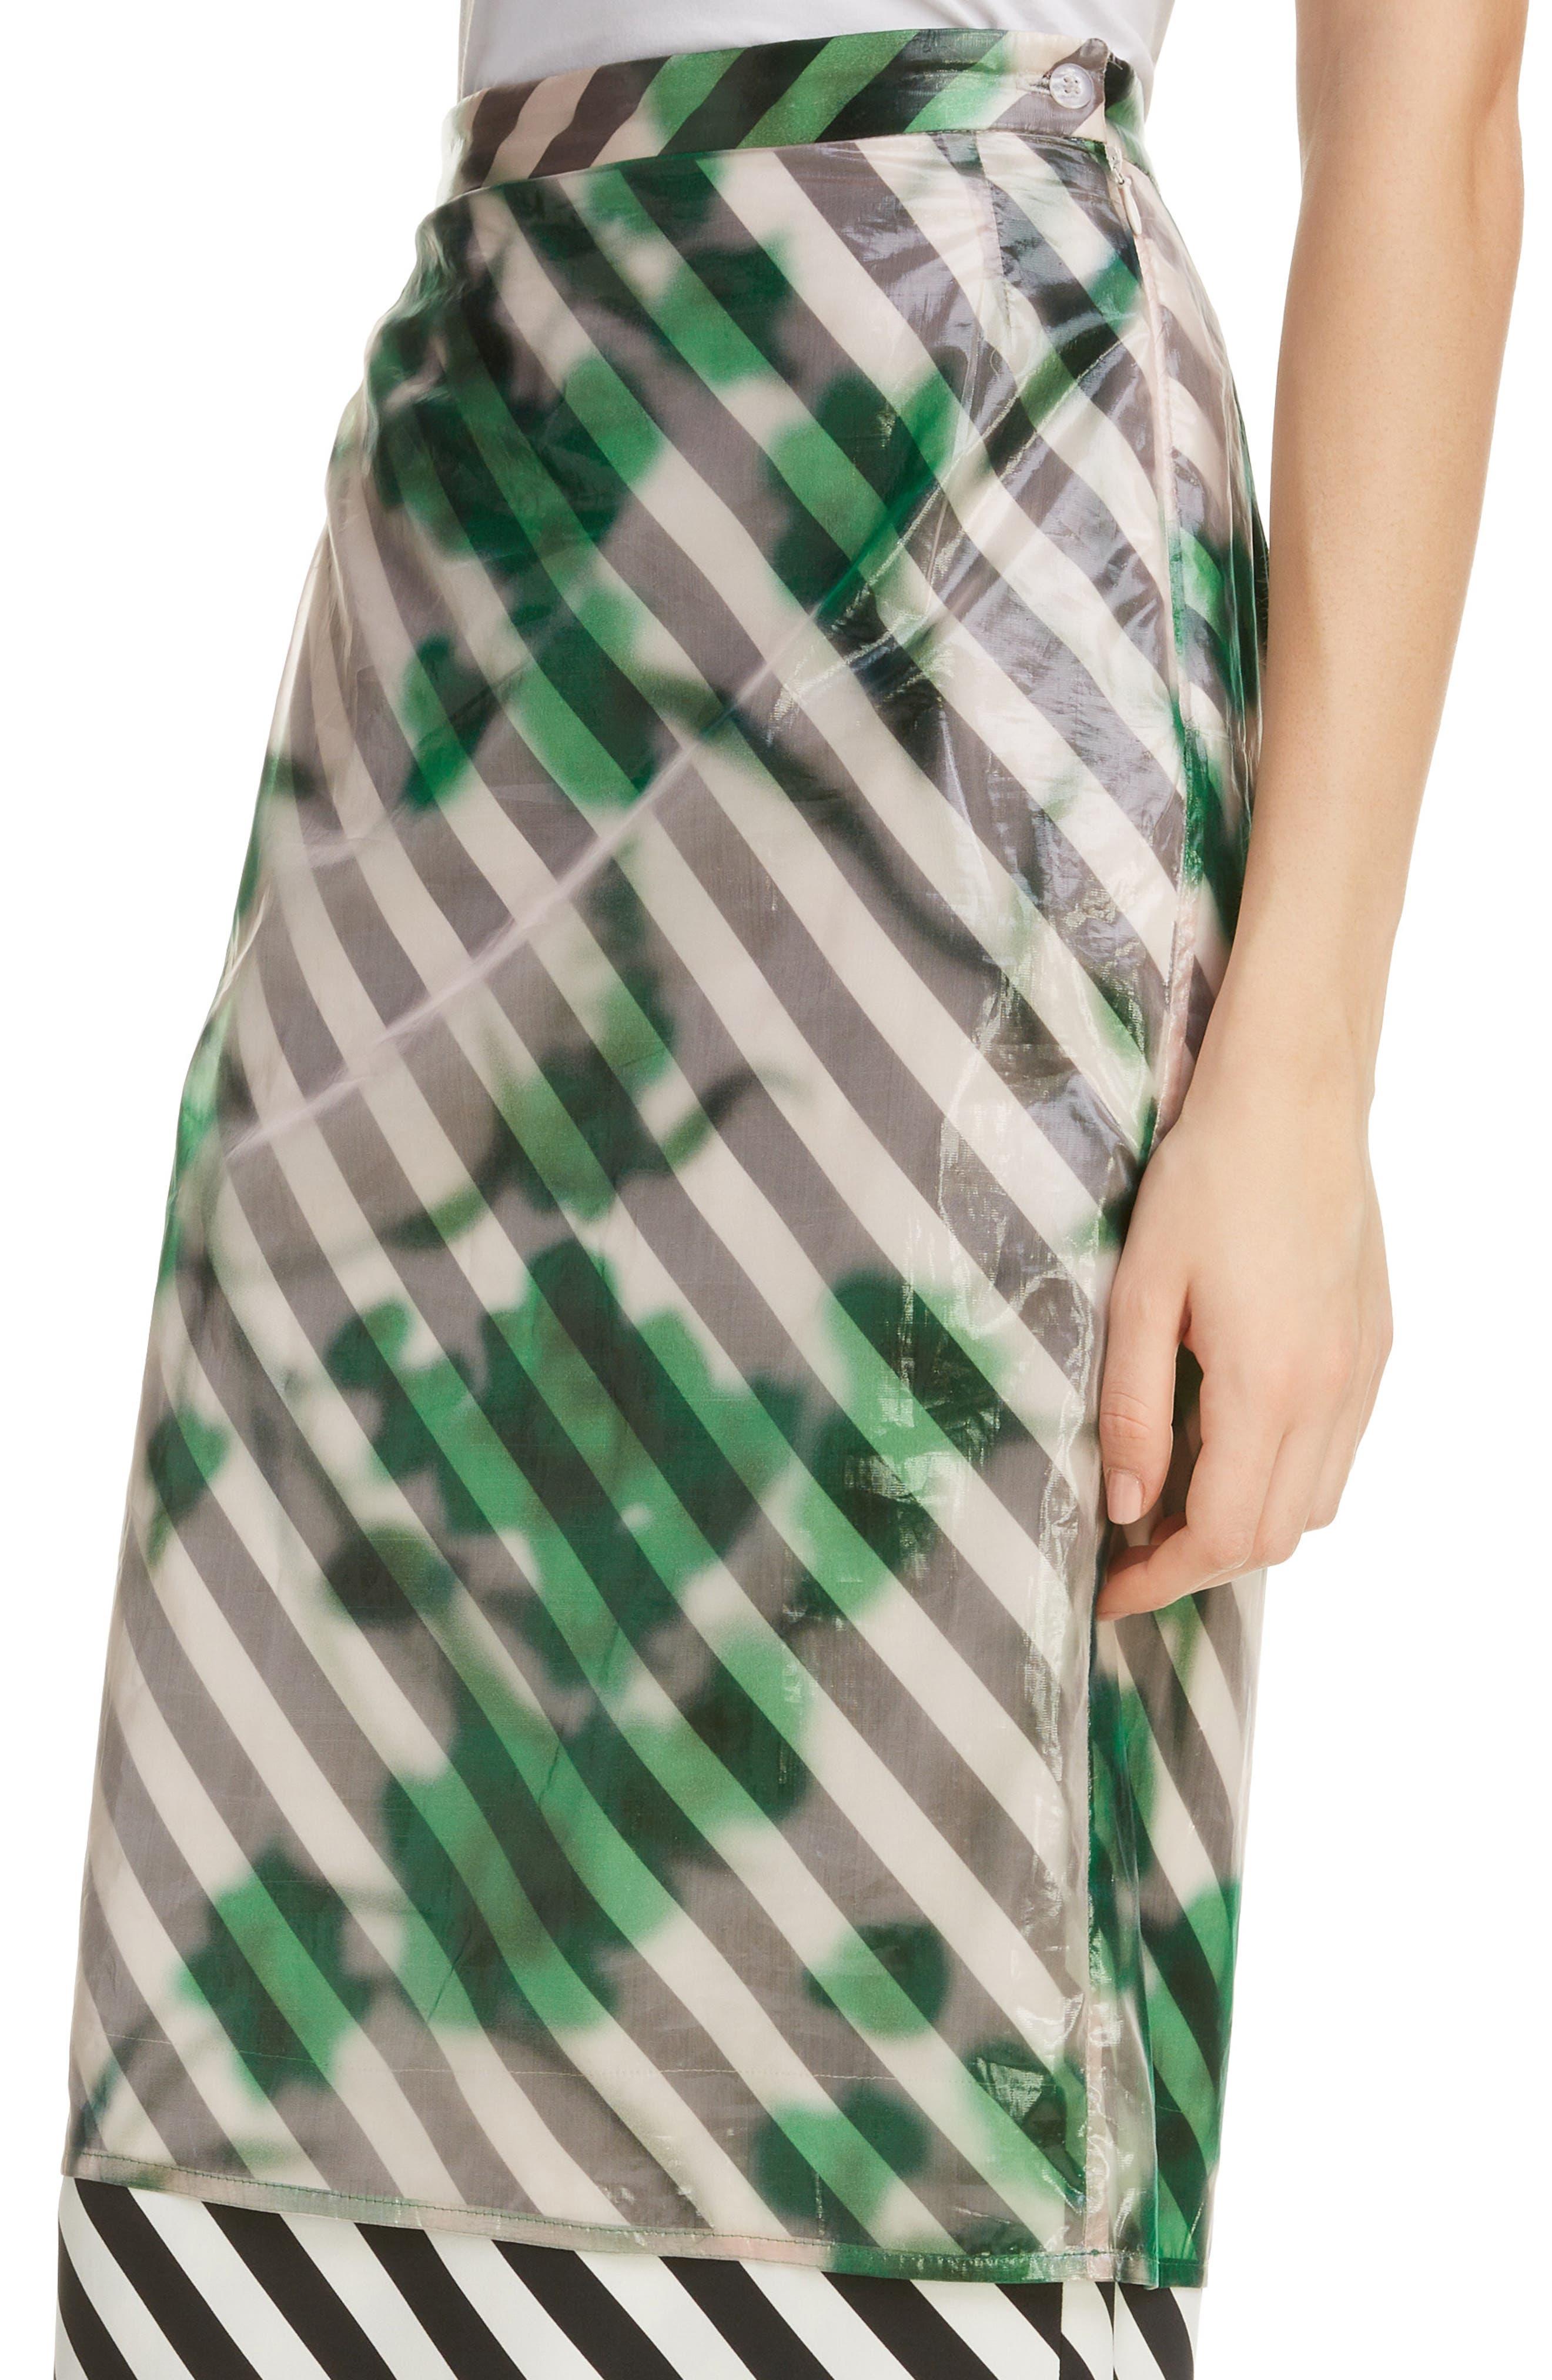 DRIES VAN NOTEN, Dires Van Noten Painted Overlay Silk Blend Pencil Skirt, Alternate thumbnail 4, color, 604-GREEN